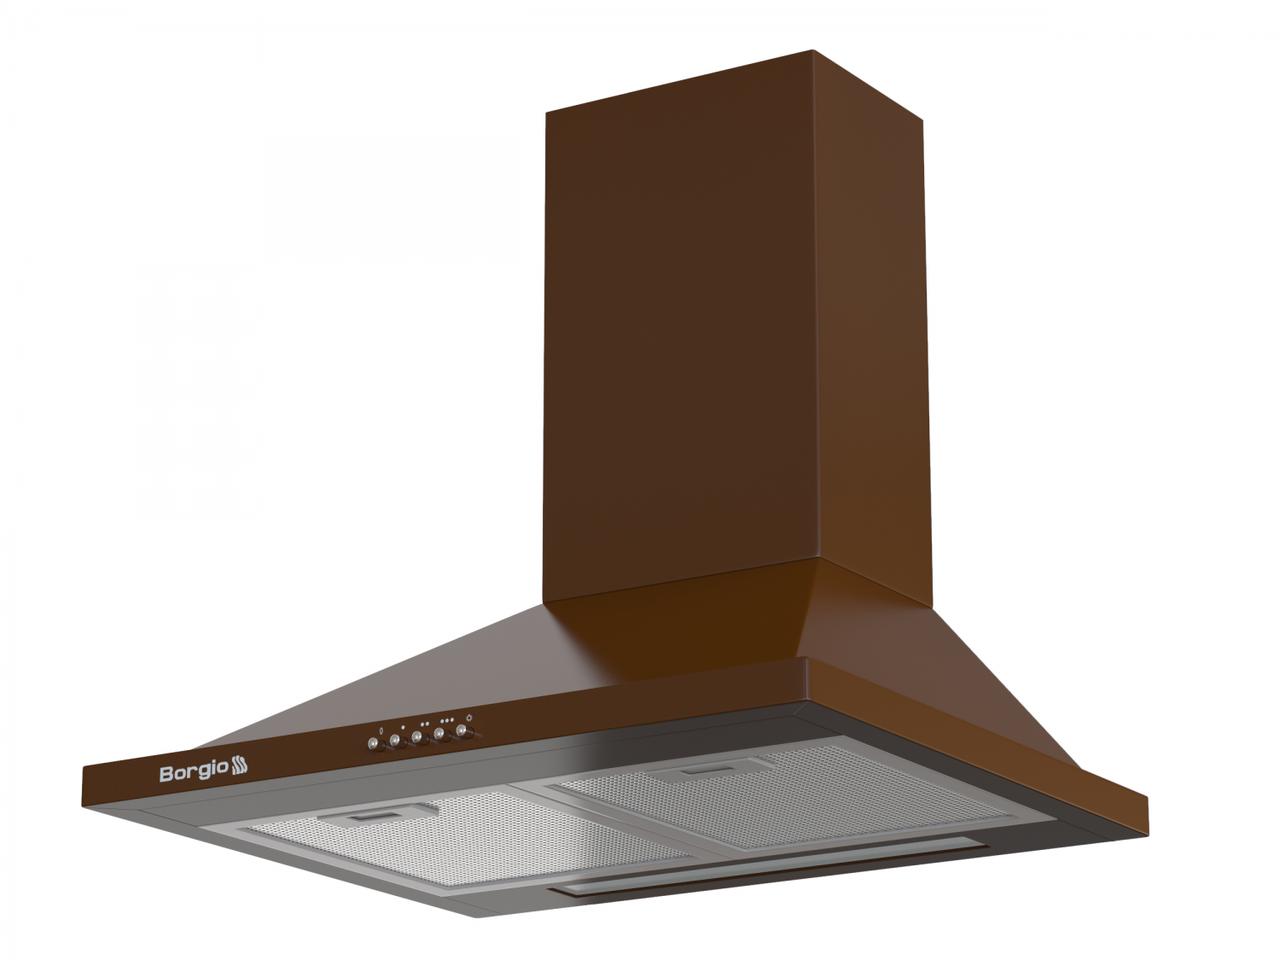 Кухонна витяжка купольна коричнева BORGIO BHK 60 brown